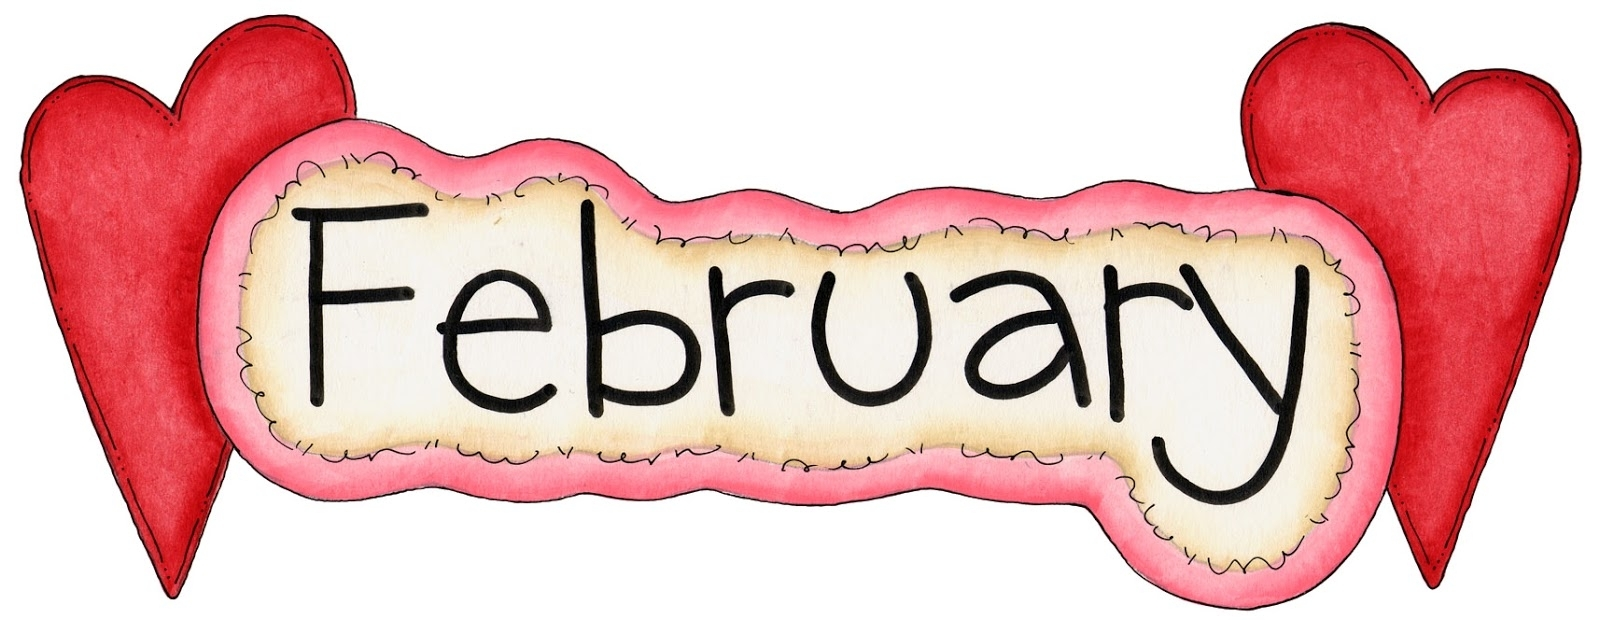 Free Calendar Headings Cliparts, Download Free Clip Art